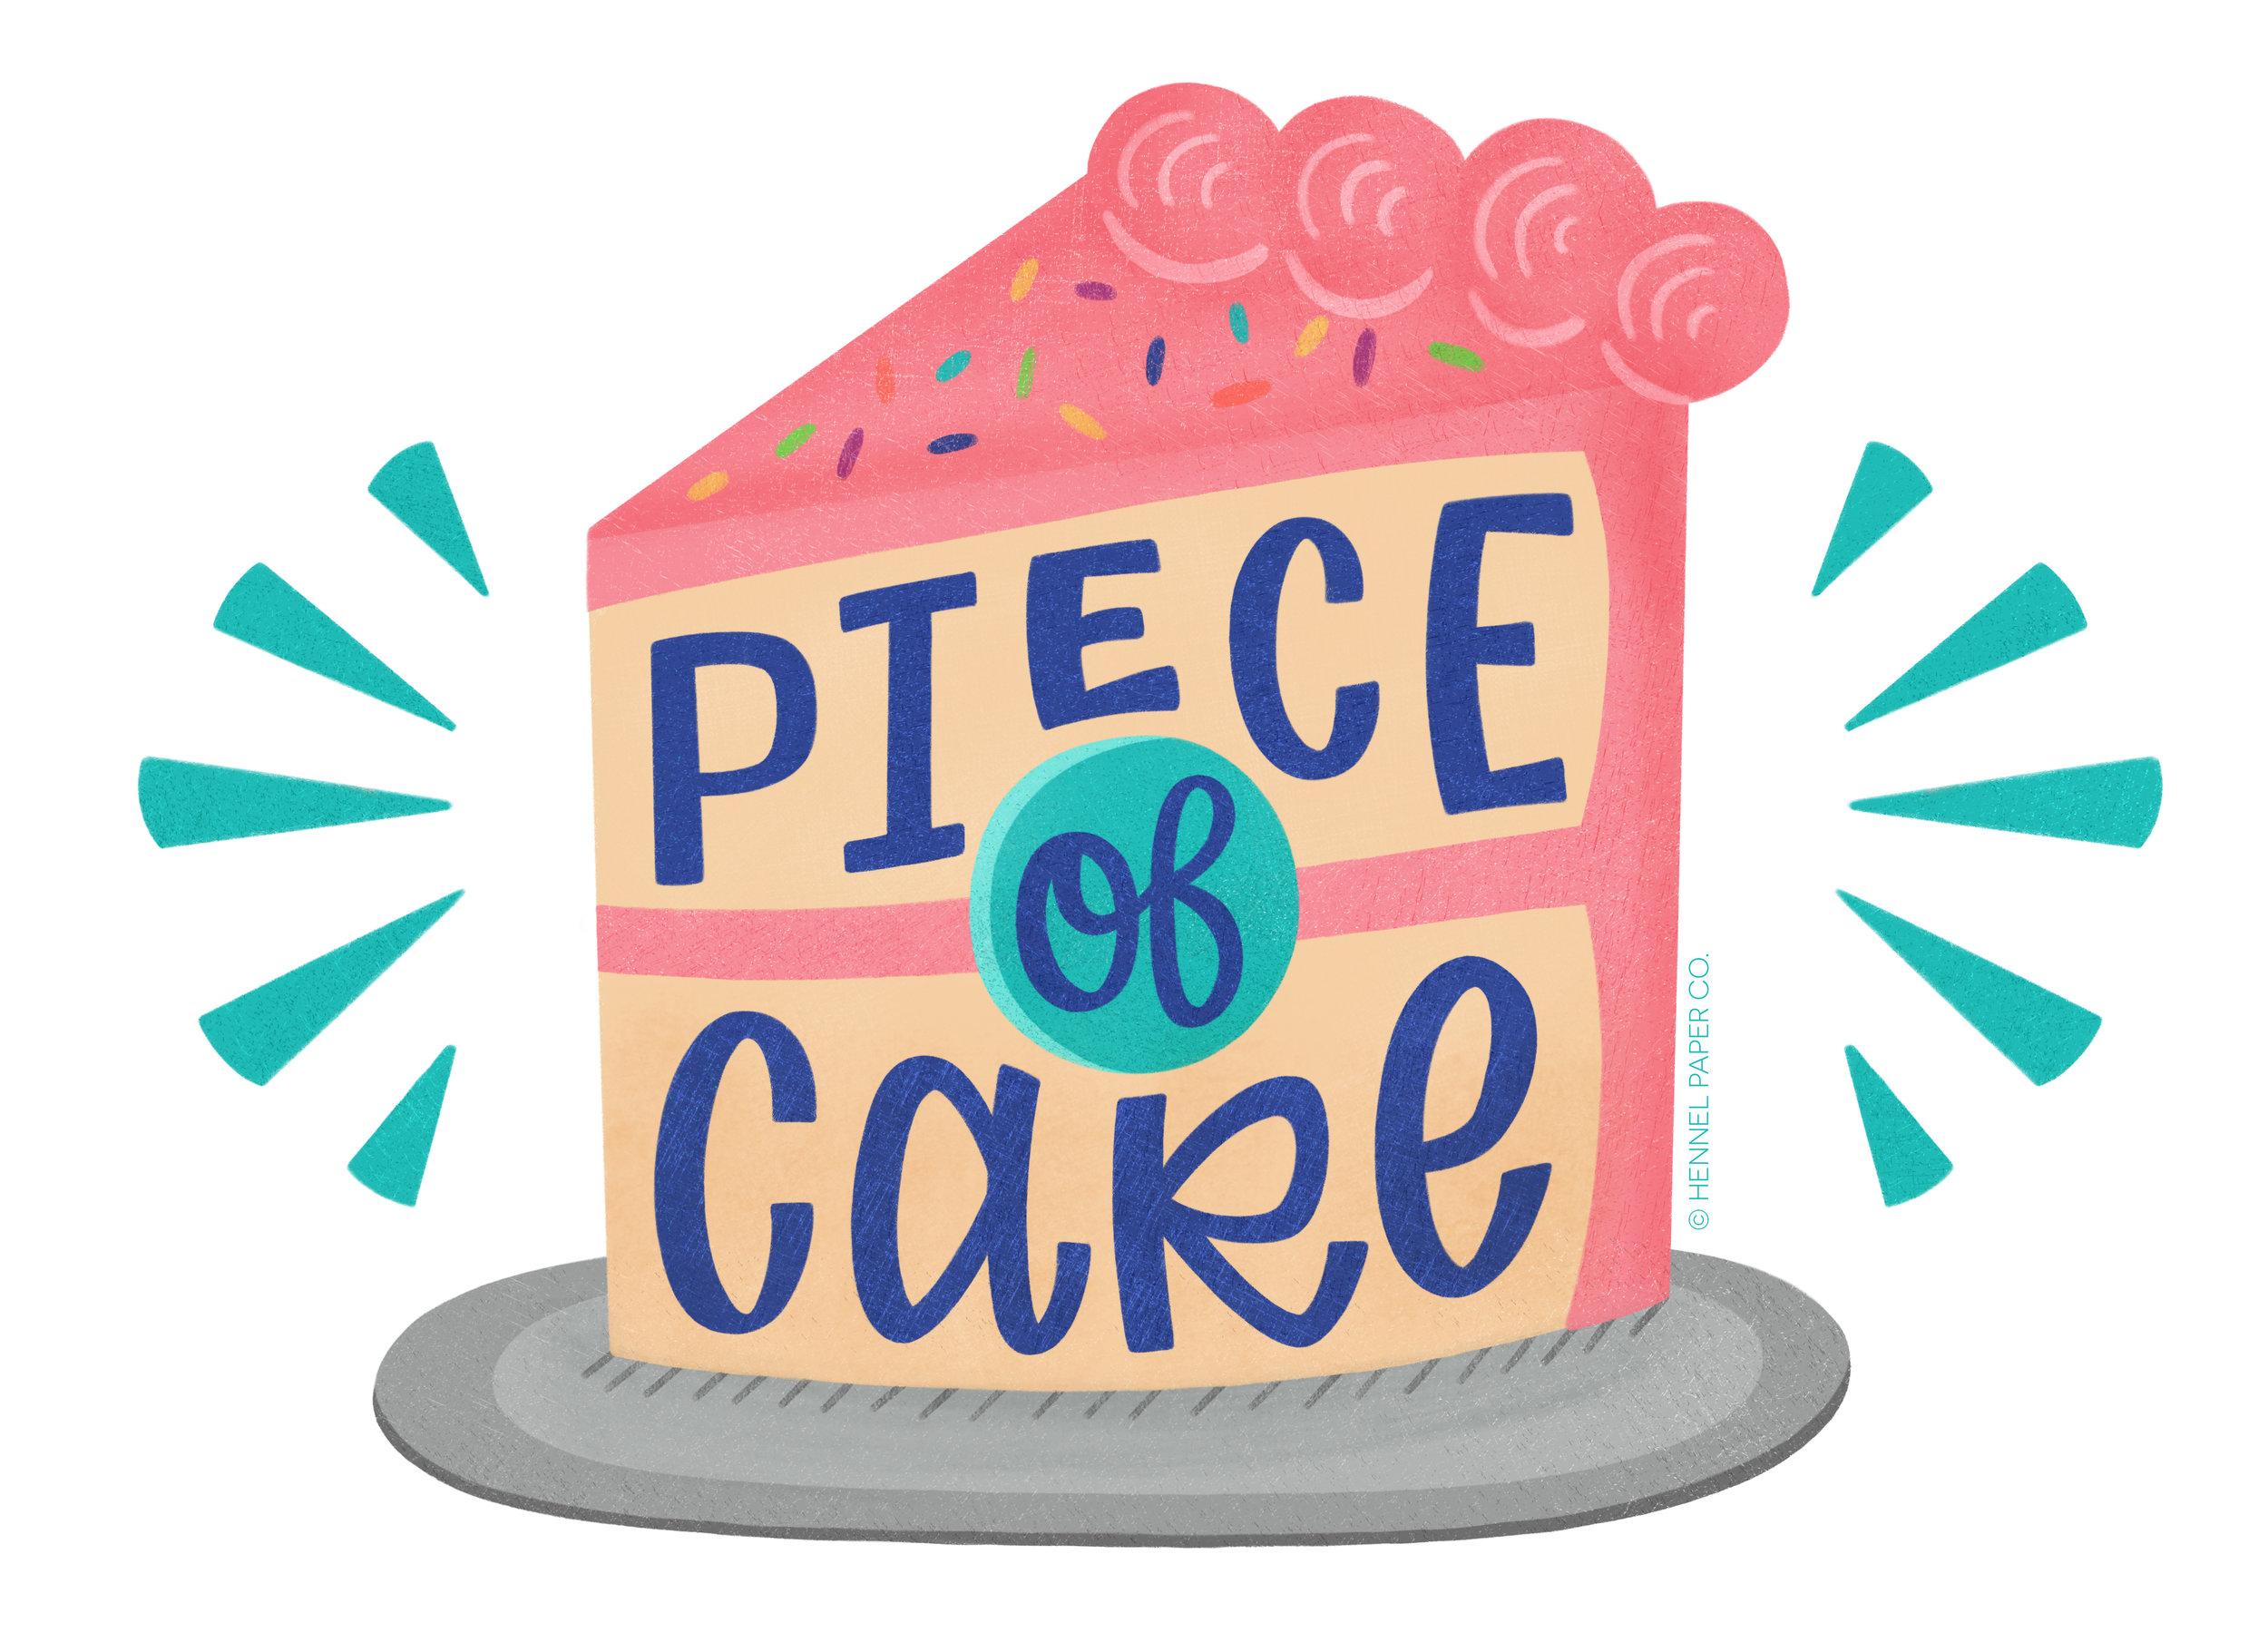 hpc piece of cake